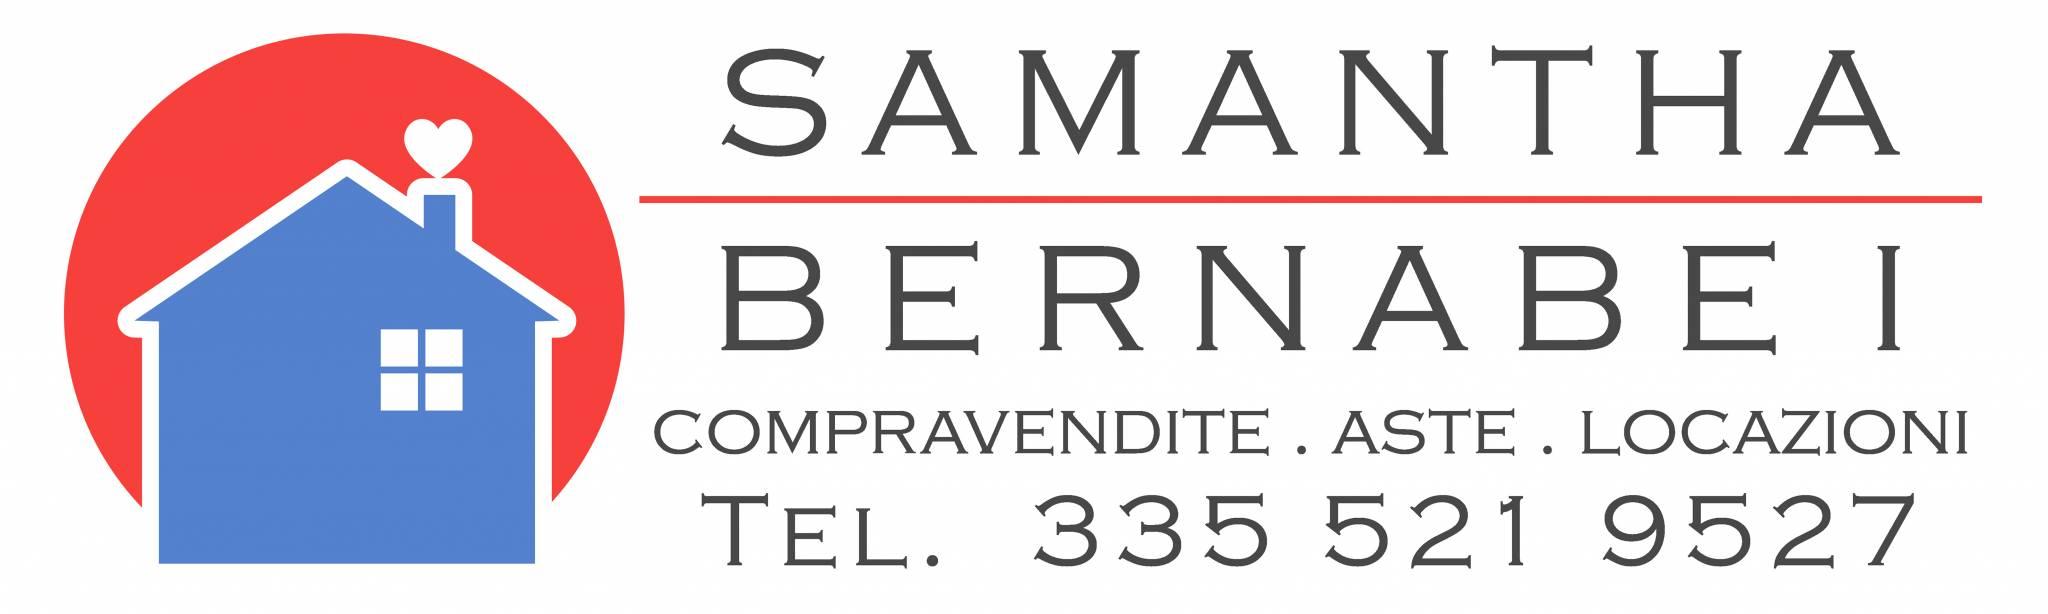 BERNABEI SAMANTHA